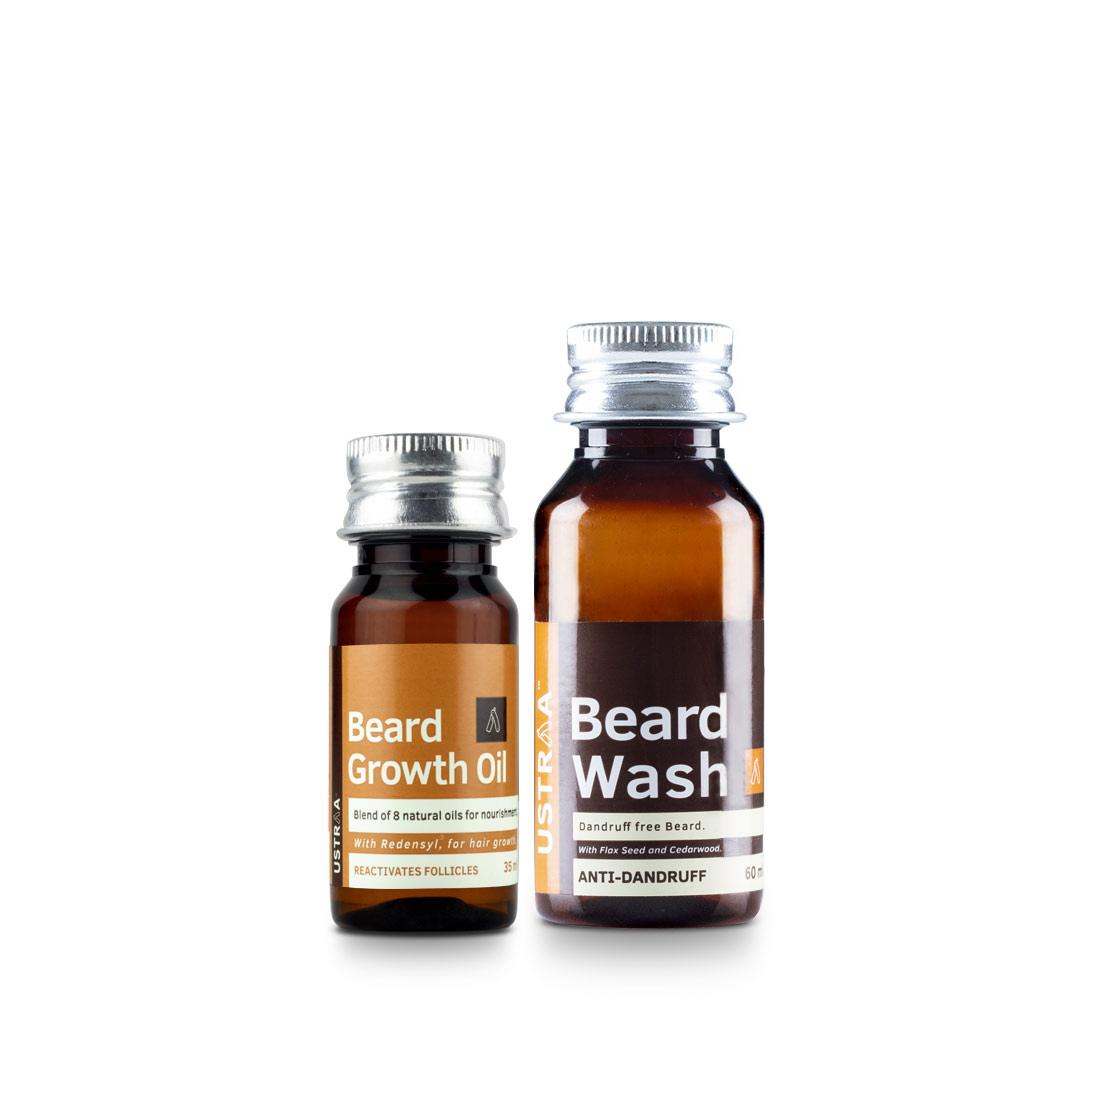 Beard Growth Oil & Beard Wash Anti dandruff